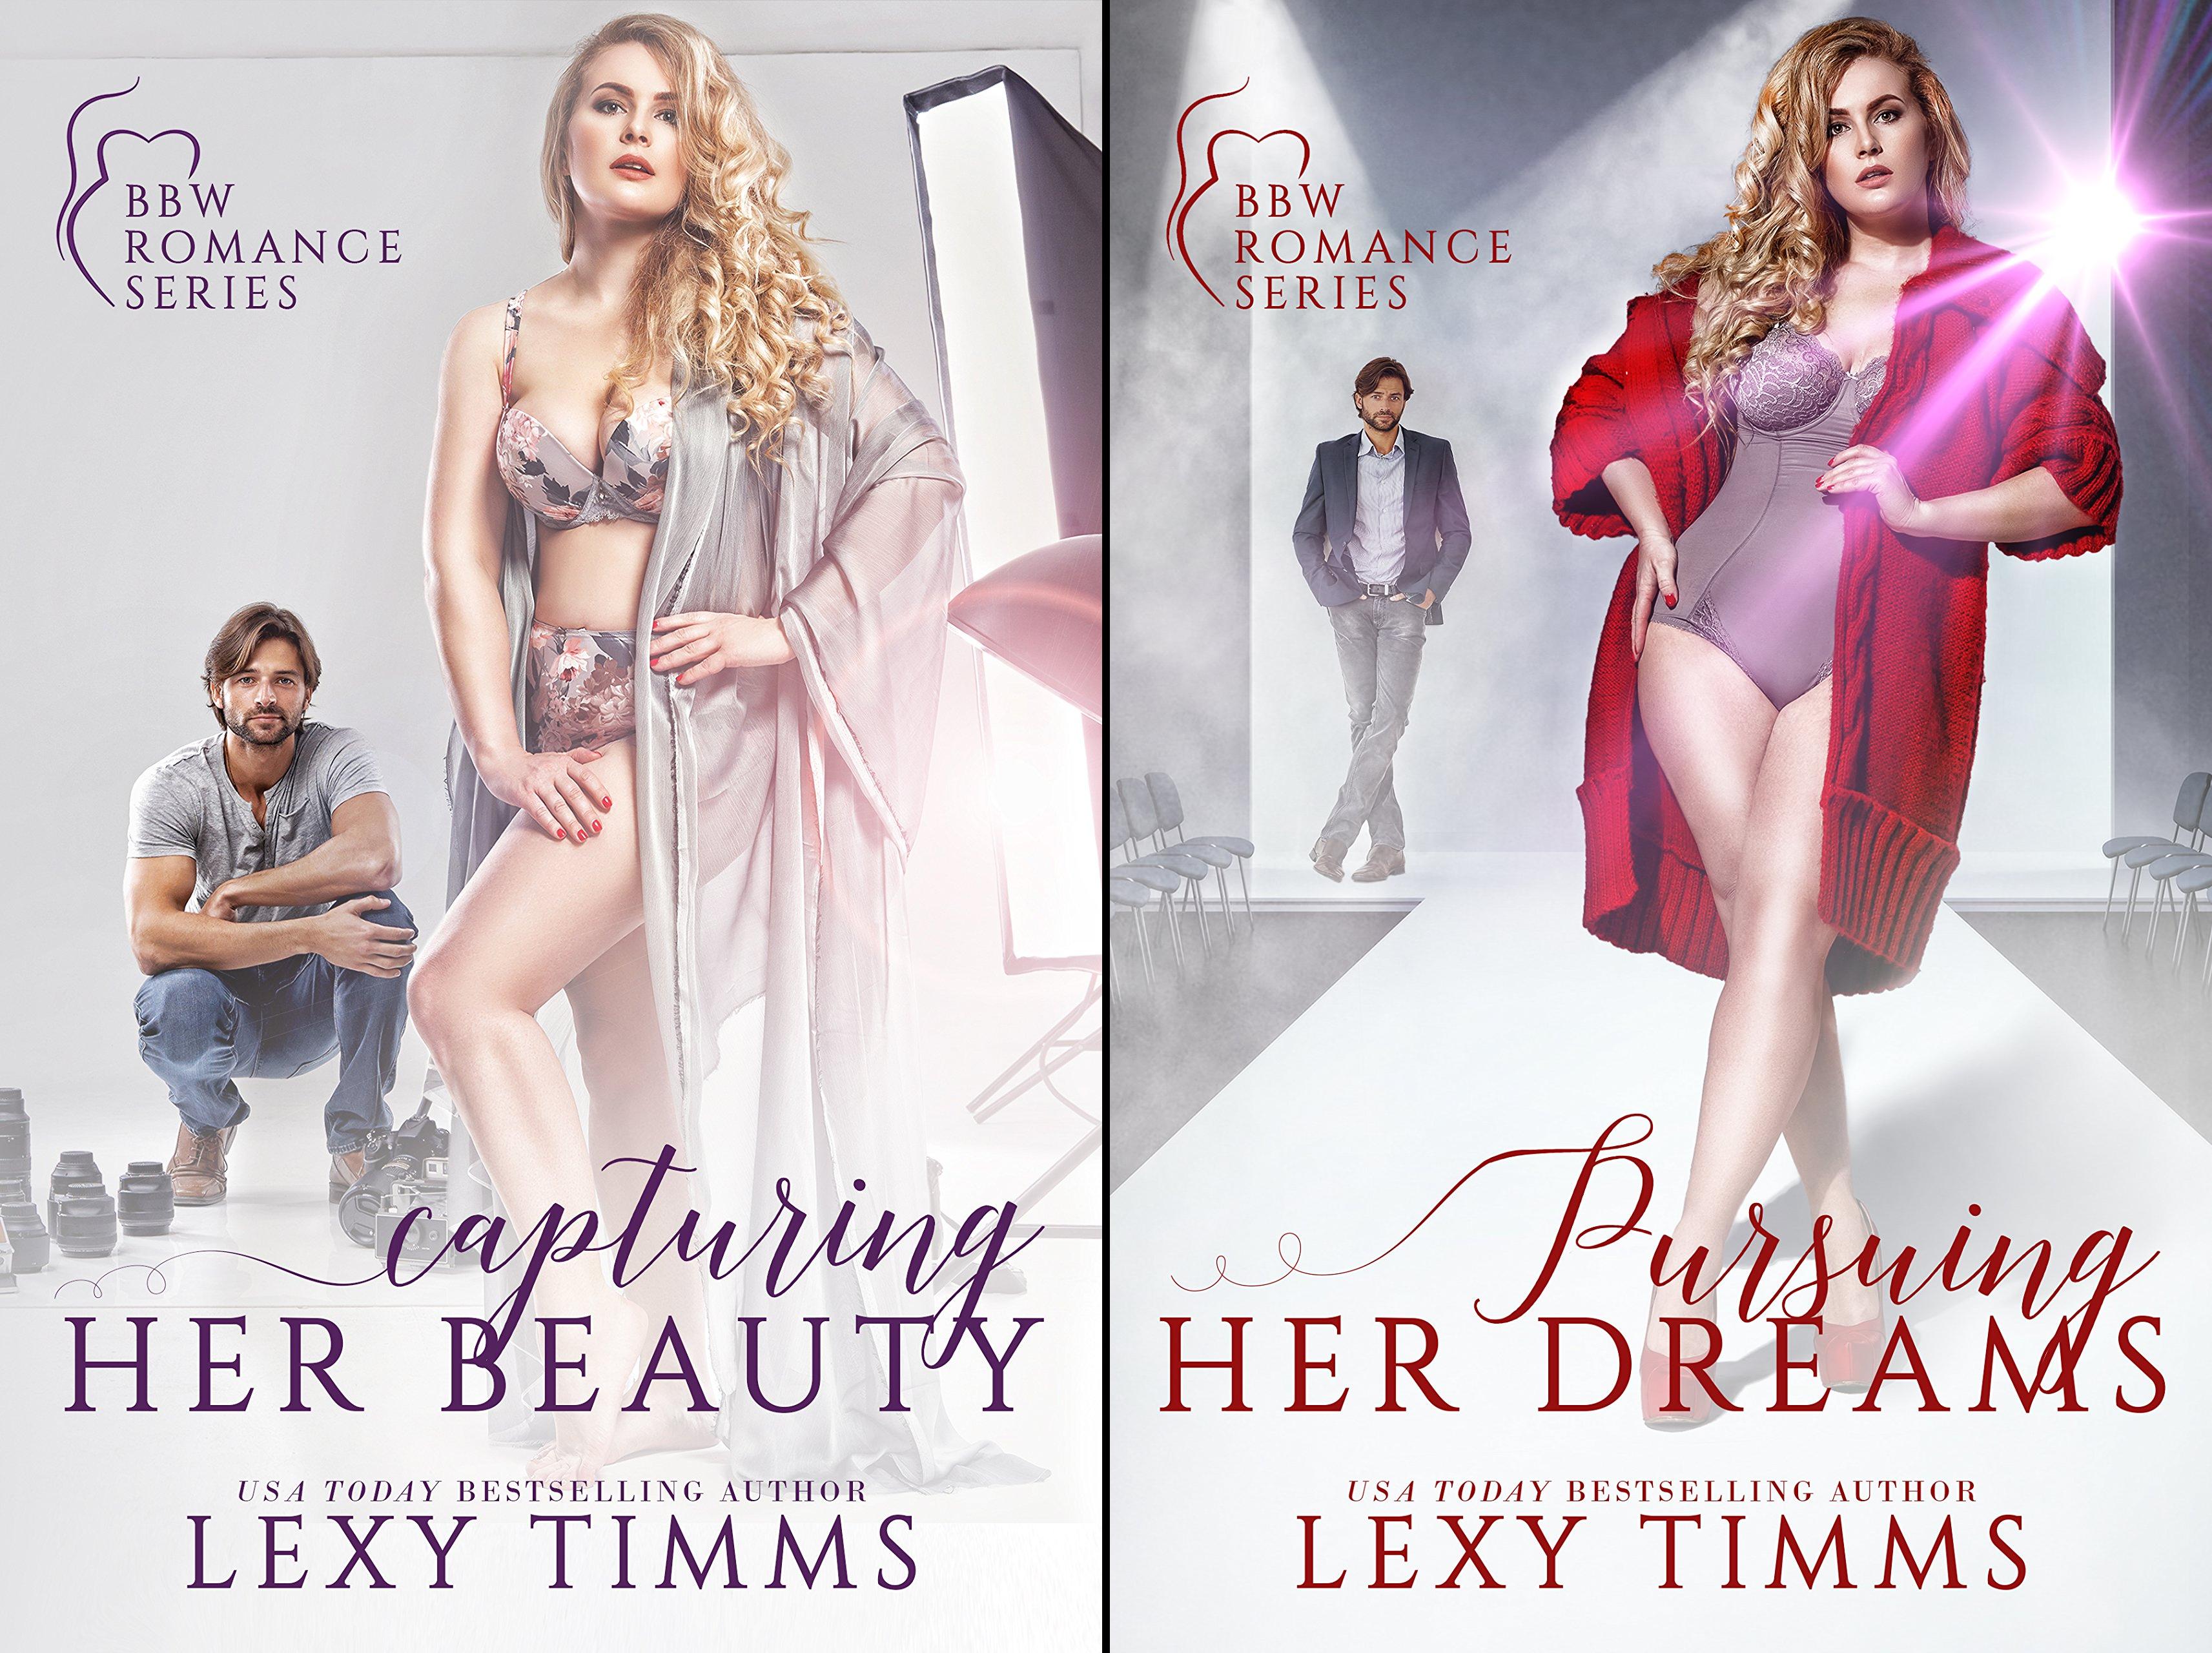 BBW Romance Series (2 Book Series)